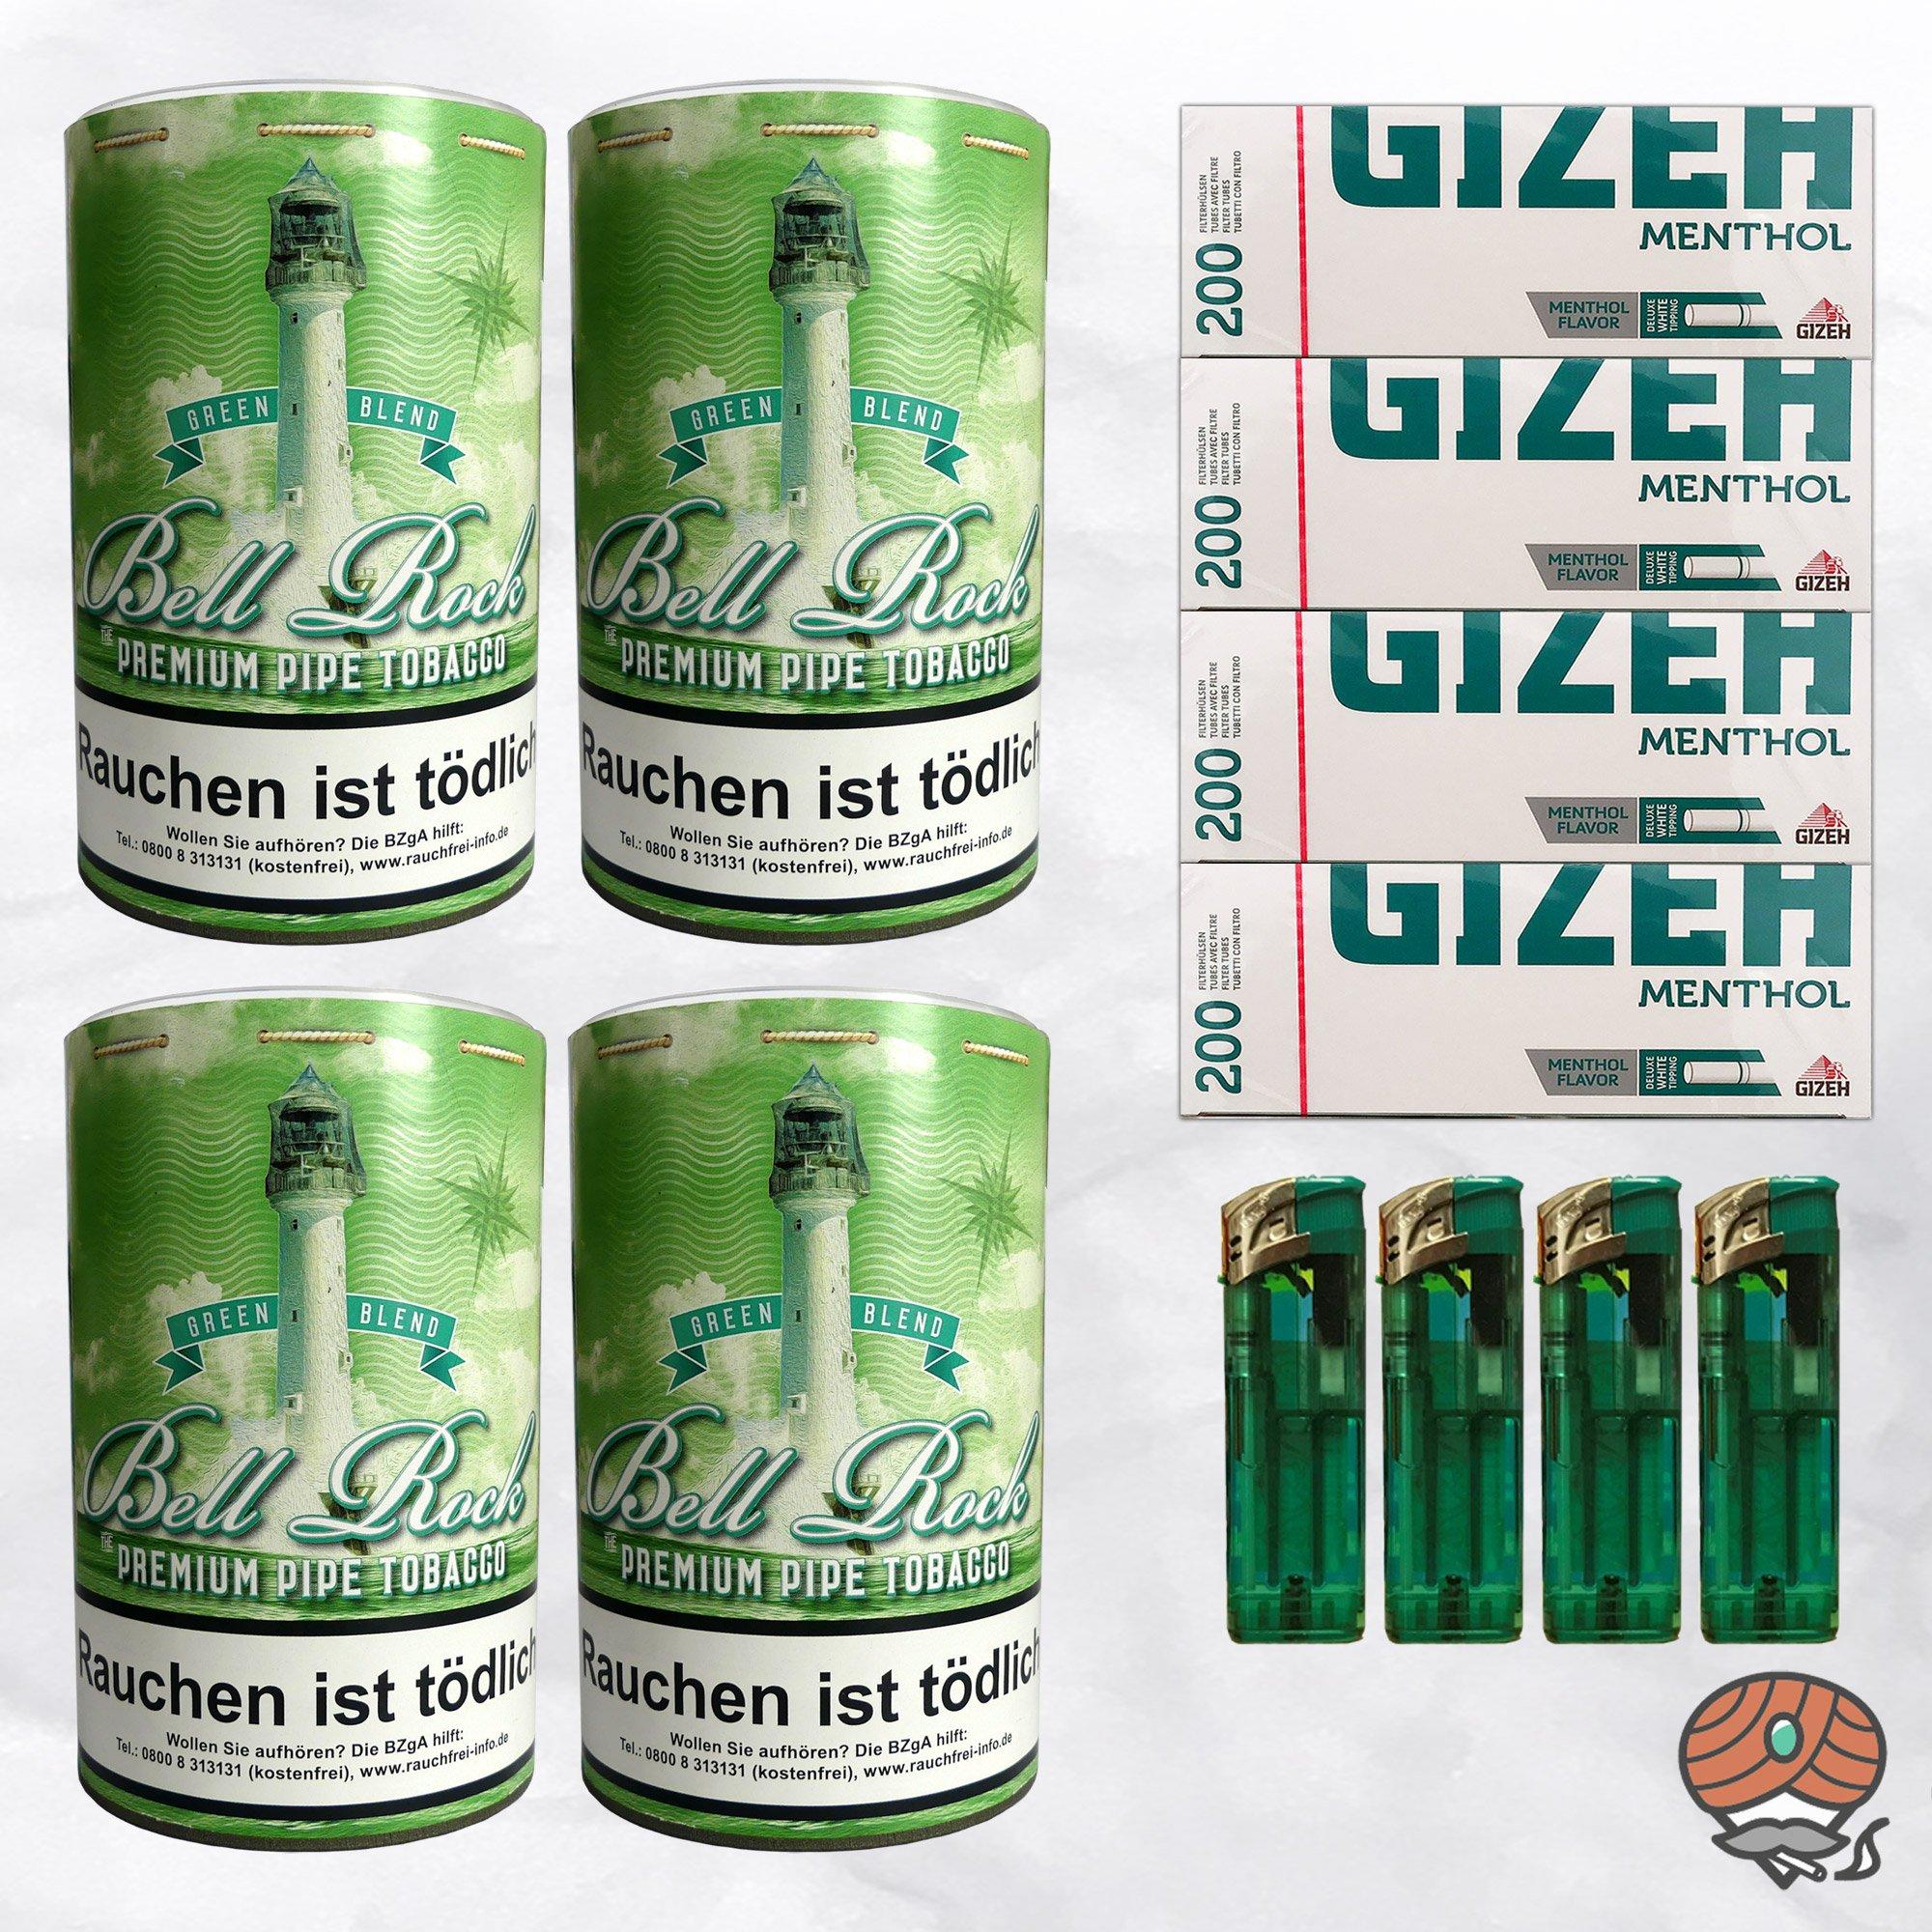 4 x Bell Rock Green Blend Menthol Pfeifentabak 160g Dose + 800 Menthol-Hülsen